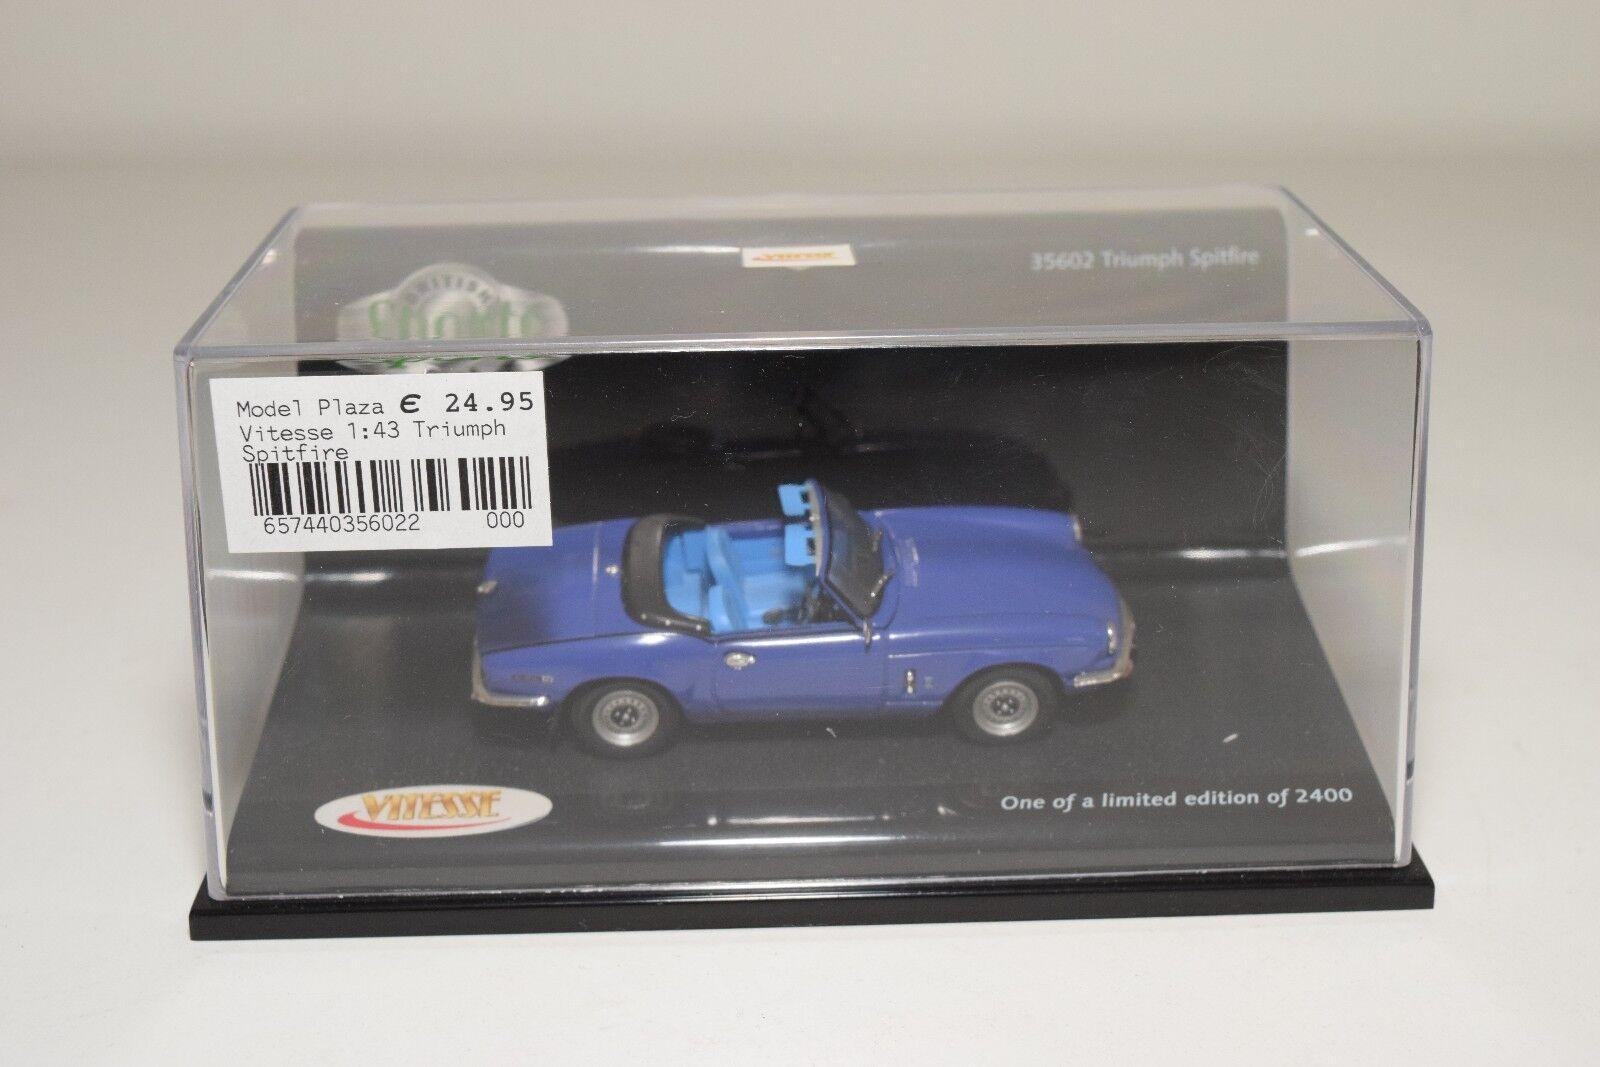 VITESSE 35602 TRIUMPH SPITFIRE blueE MINT BOXED 005da2